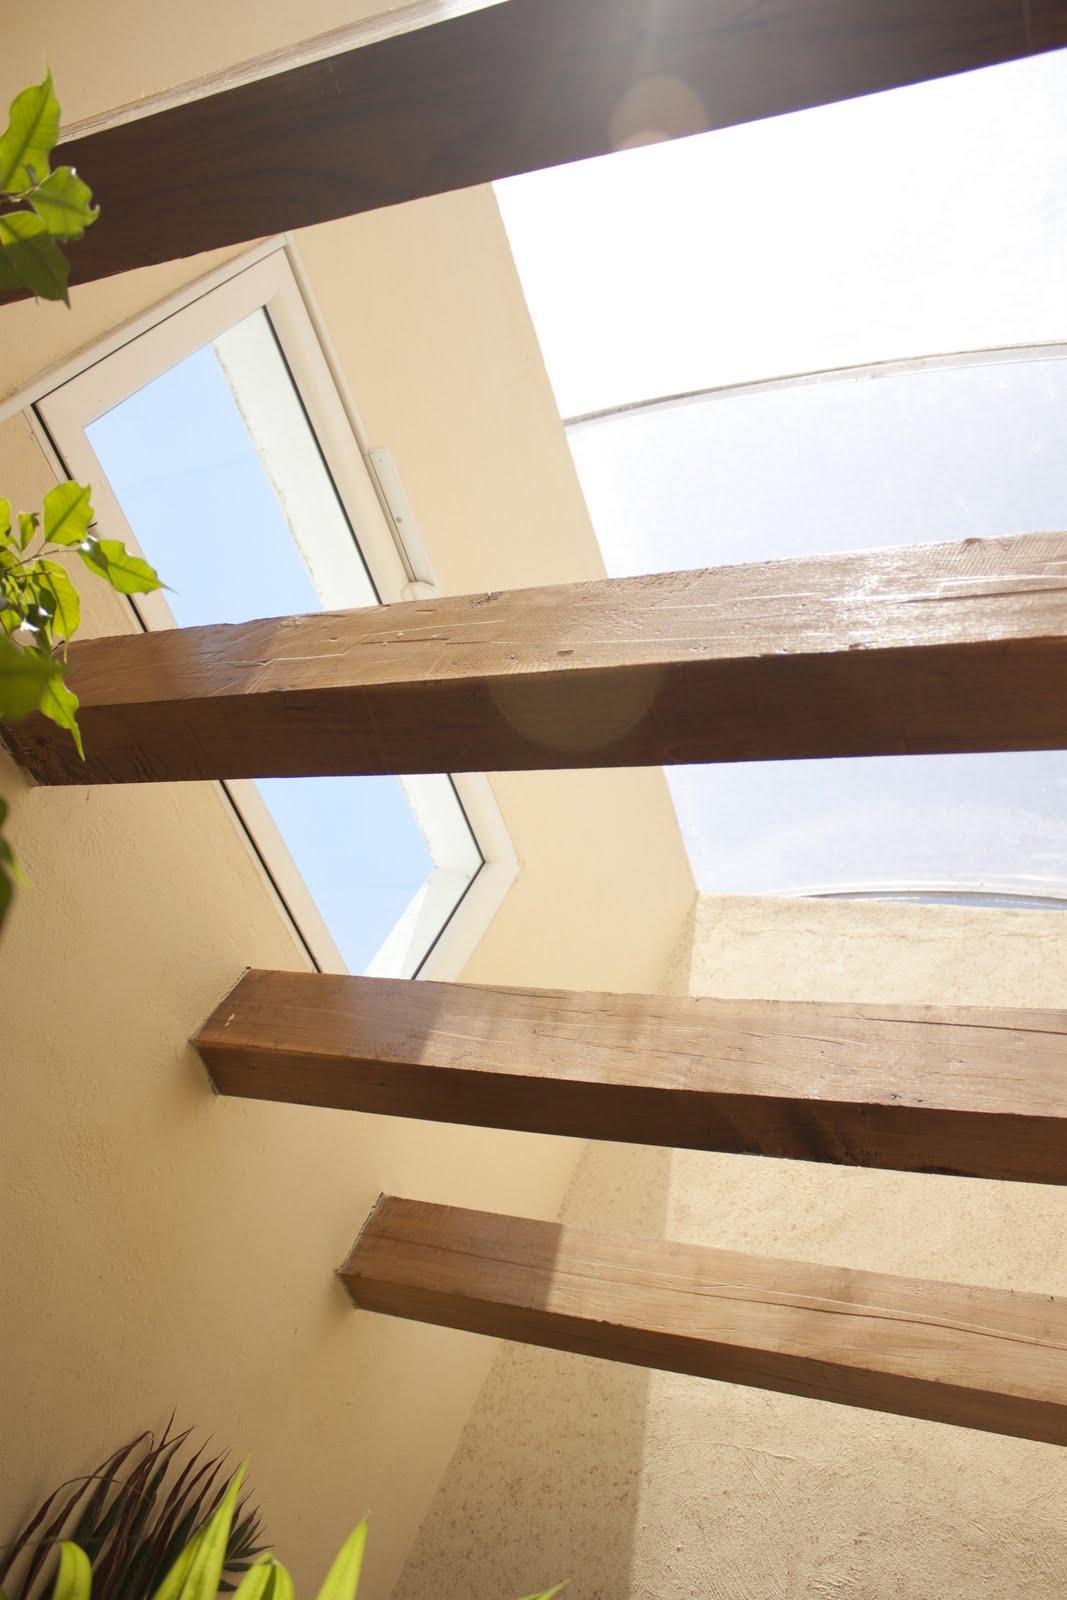 Interiores arquitect nicos pinkaiz for Vigas de madera para jardin